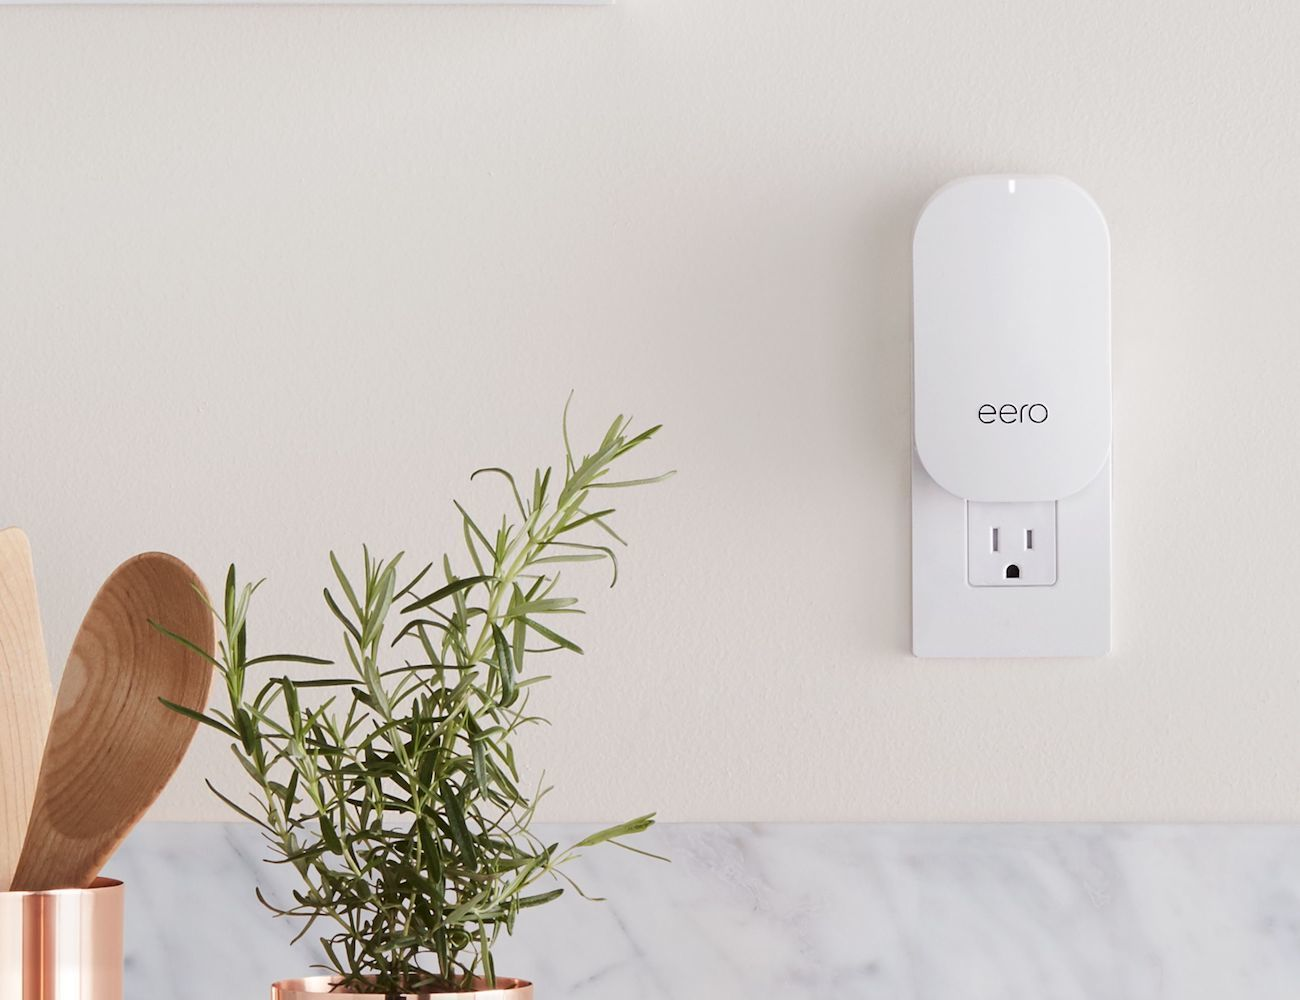 Eero+True+Mesh+Home+Wi-Fi+System